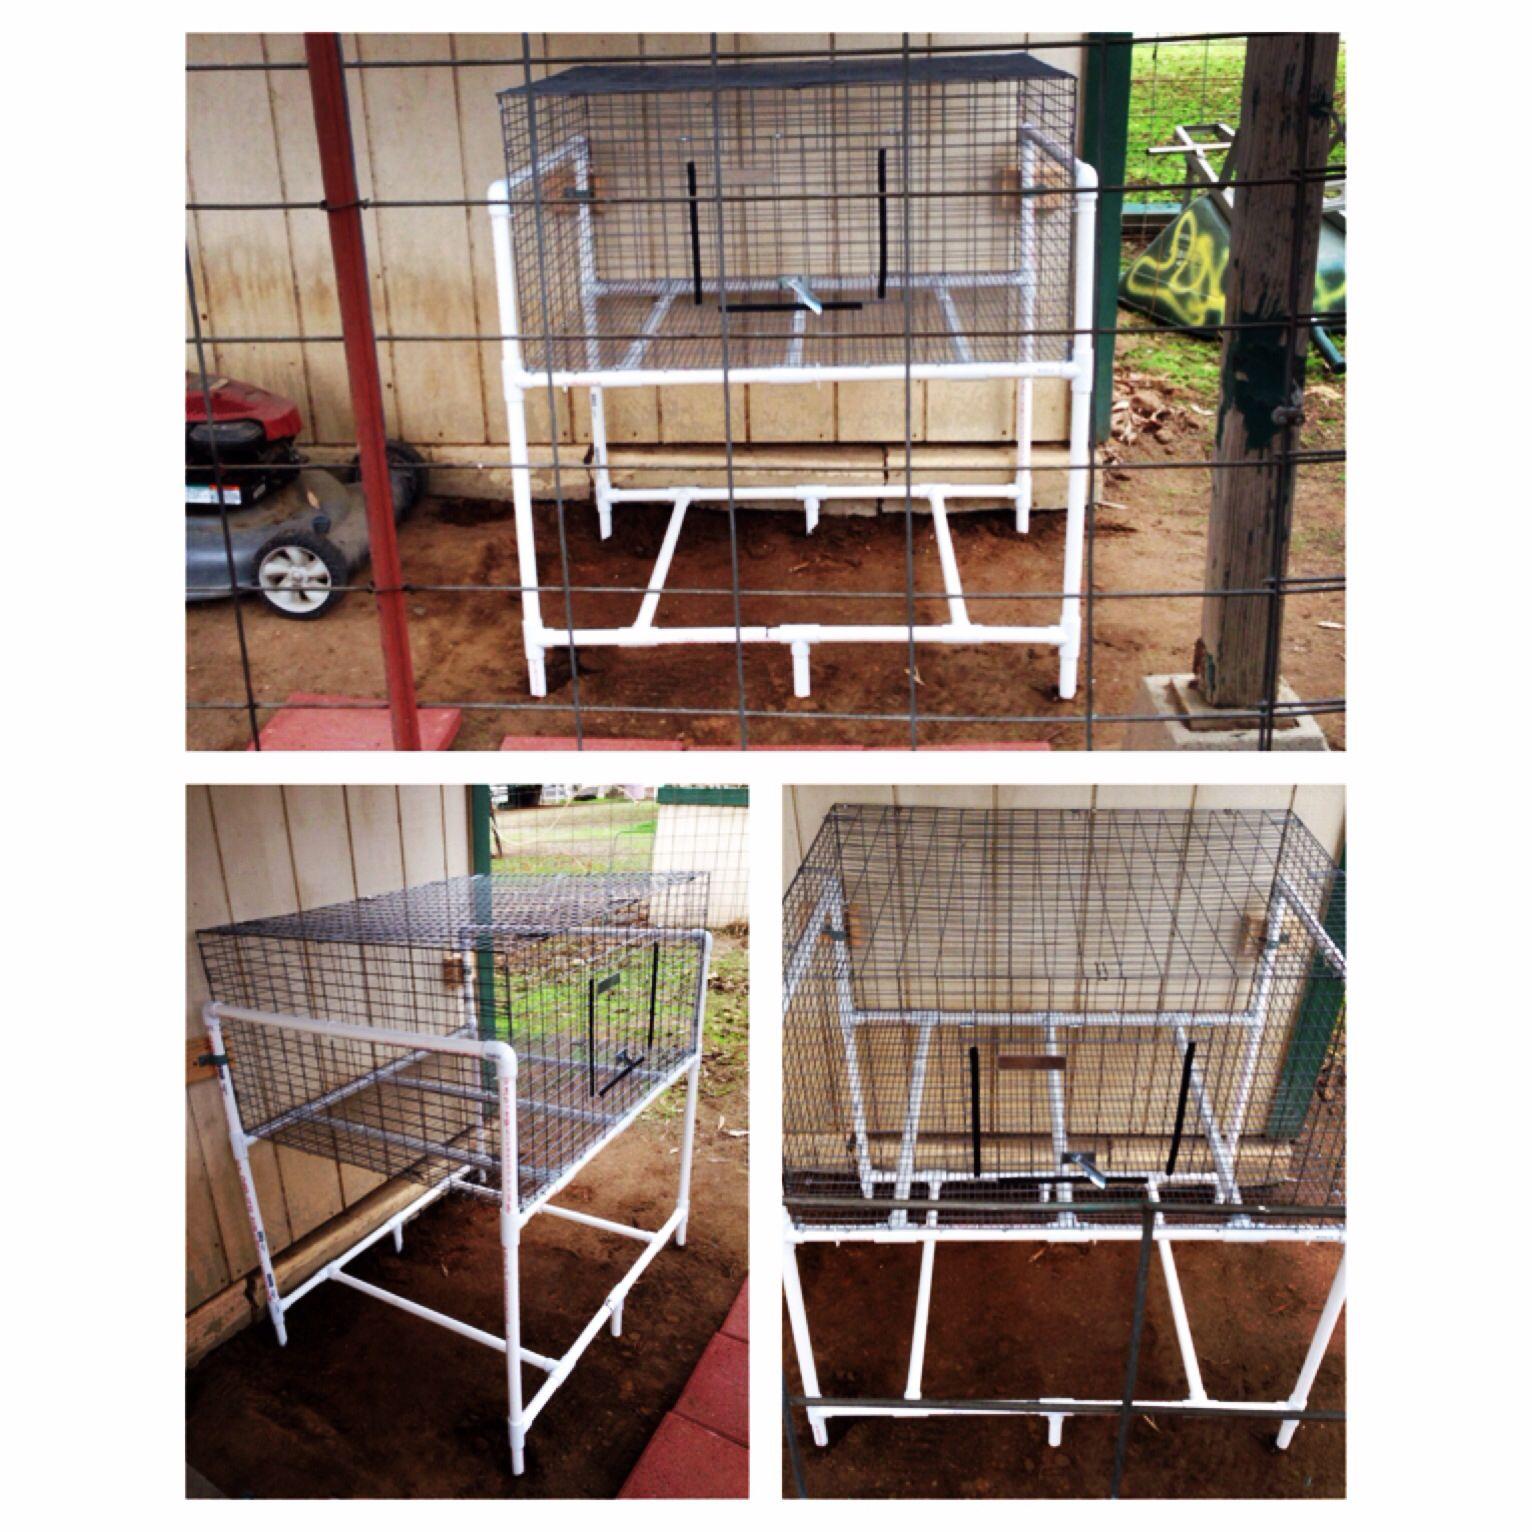 Diy pvc rabbit wire cage rack rabbits pinterest for Pvc rabbit cage